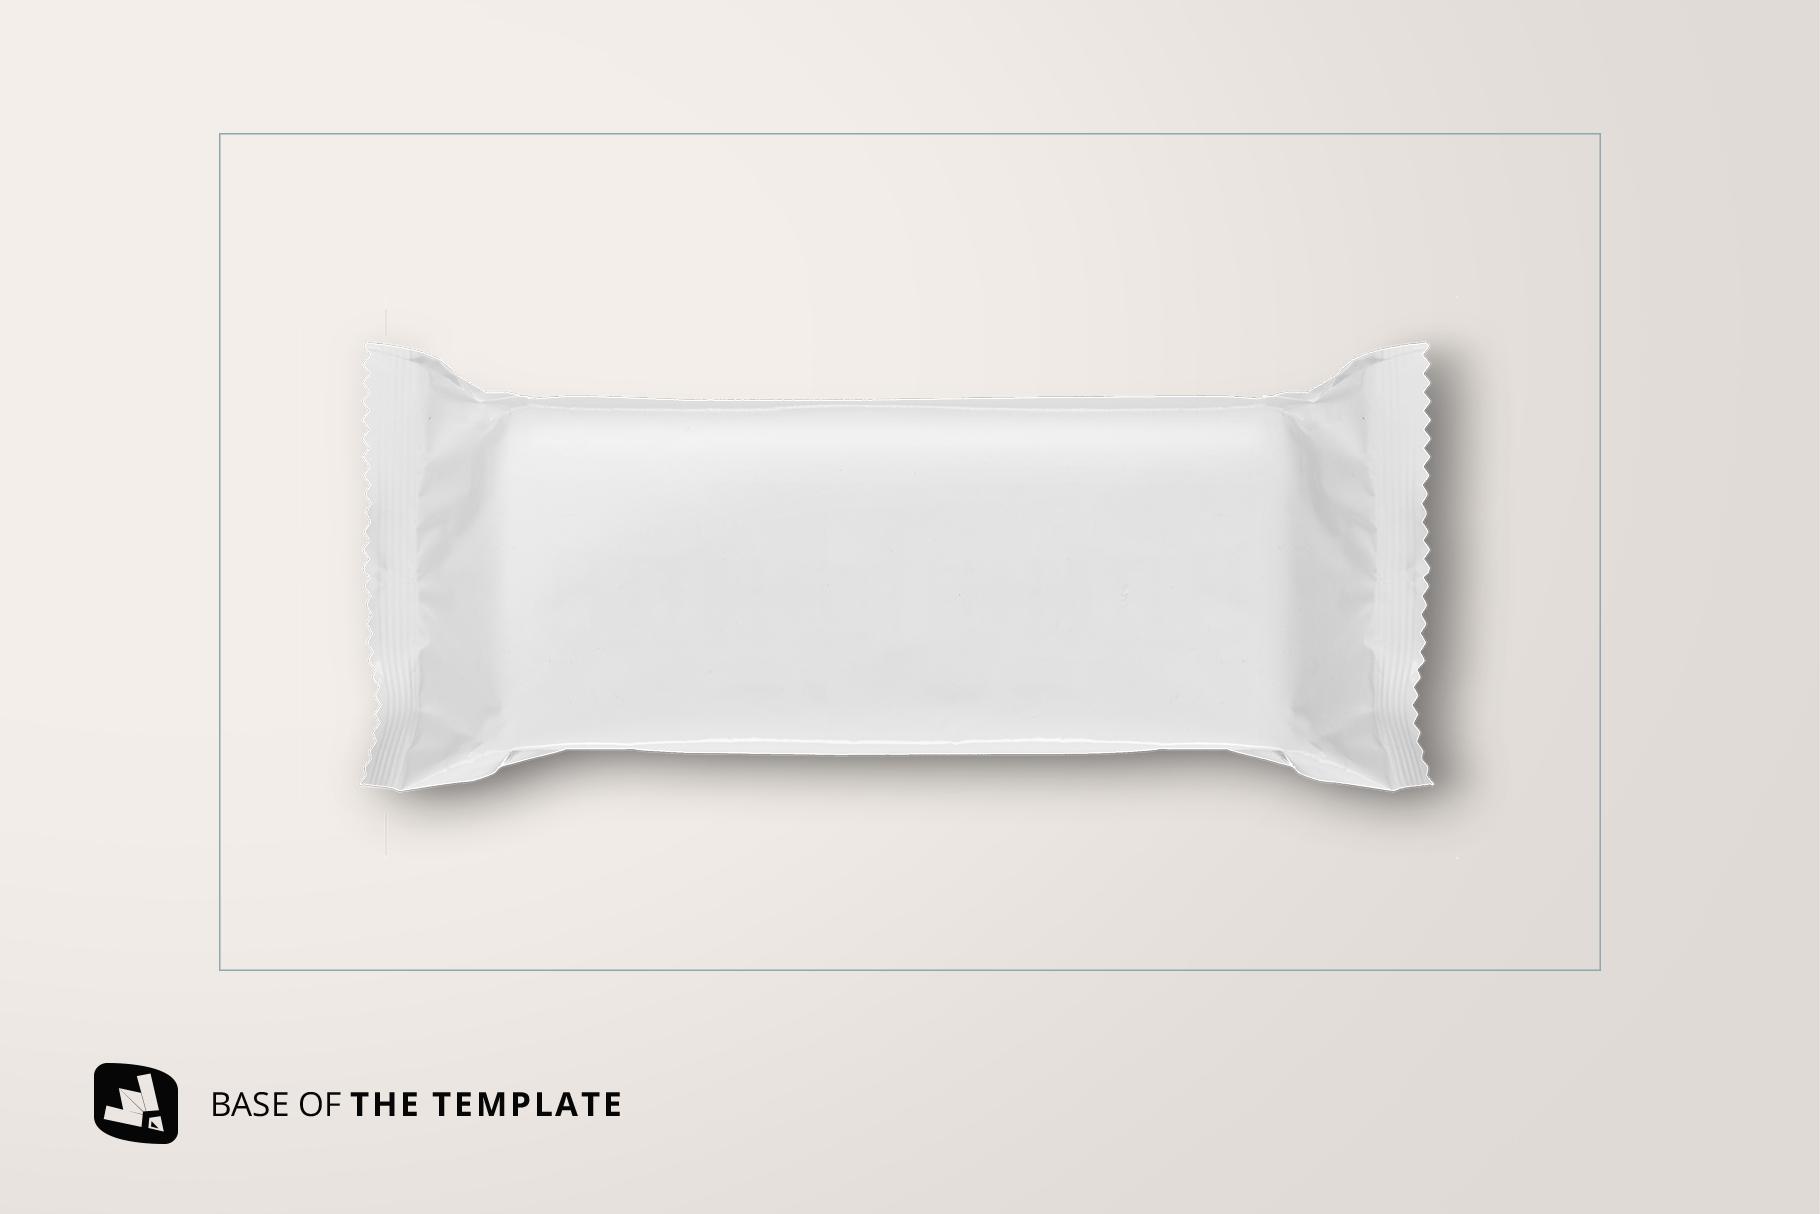 base image of the top view aluminium pack mockup